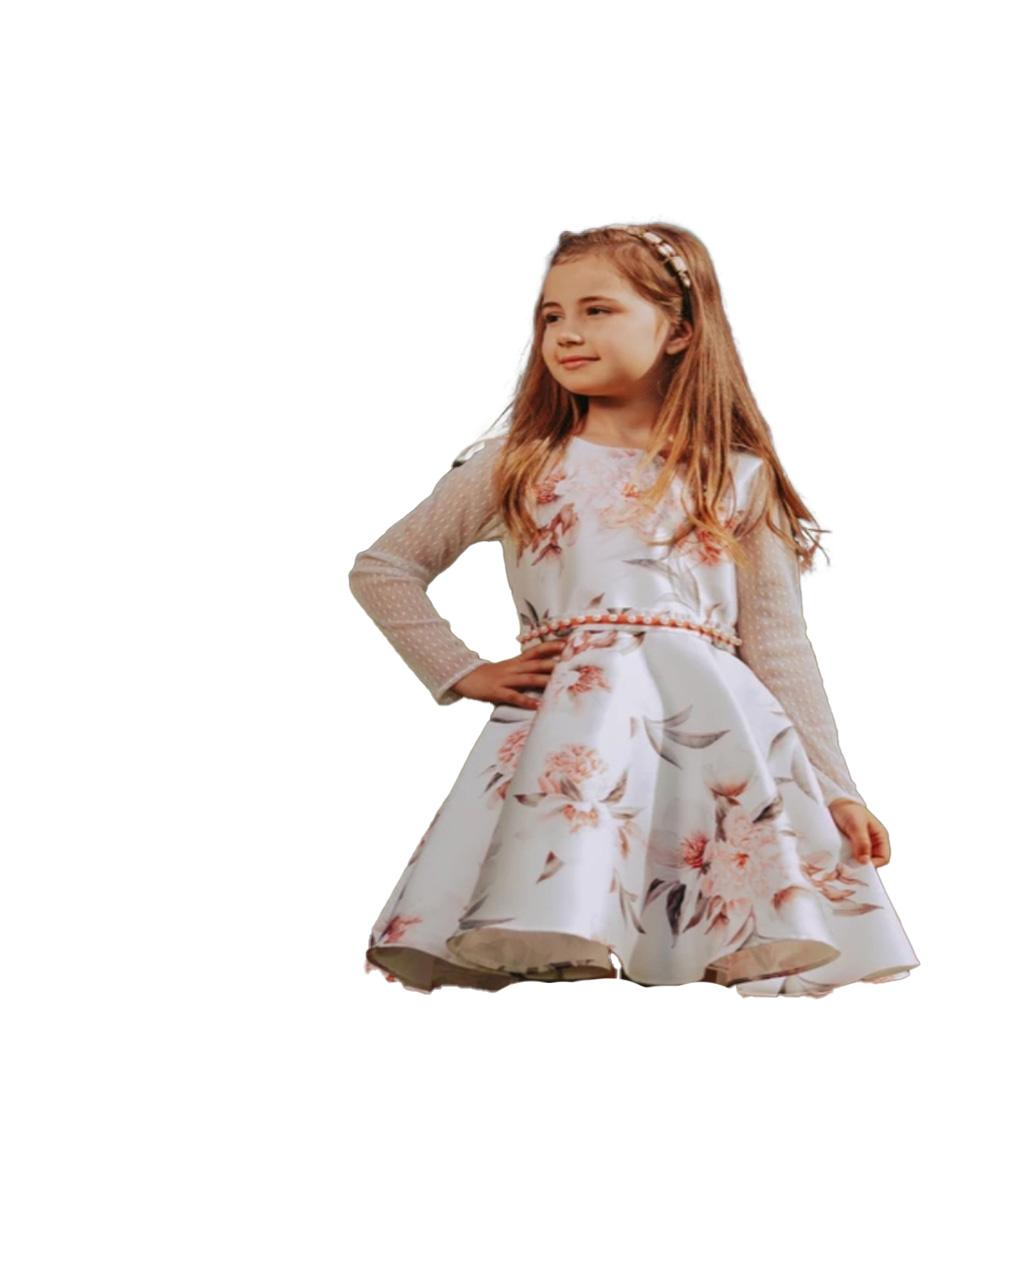 Vestido Infantil Floral Cinto Bordado Pérolas Bambollina